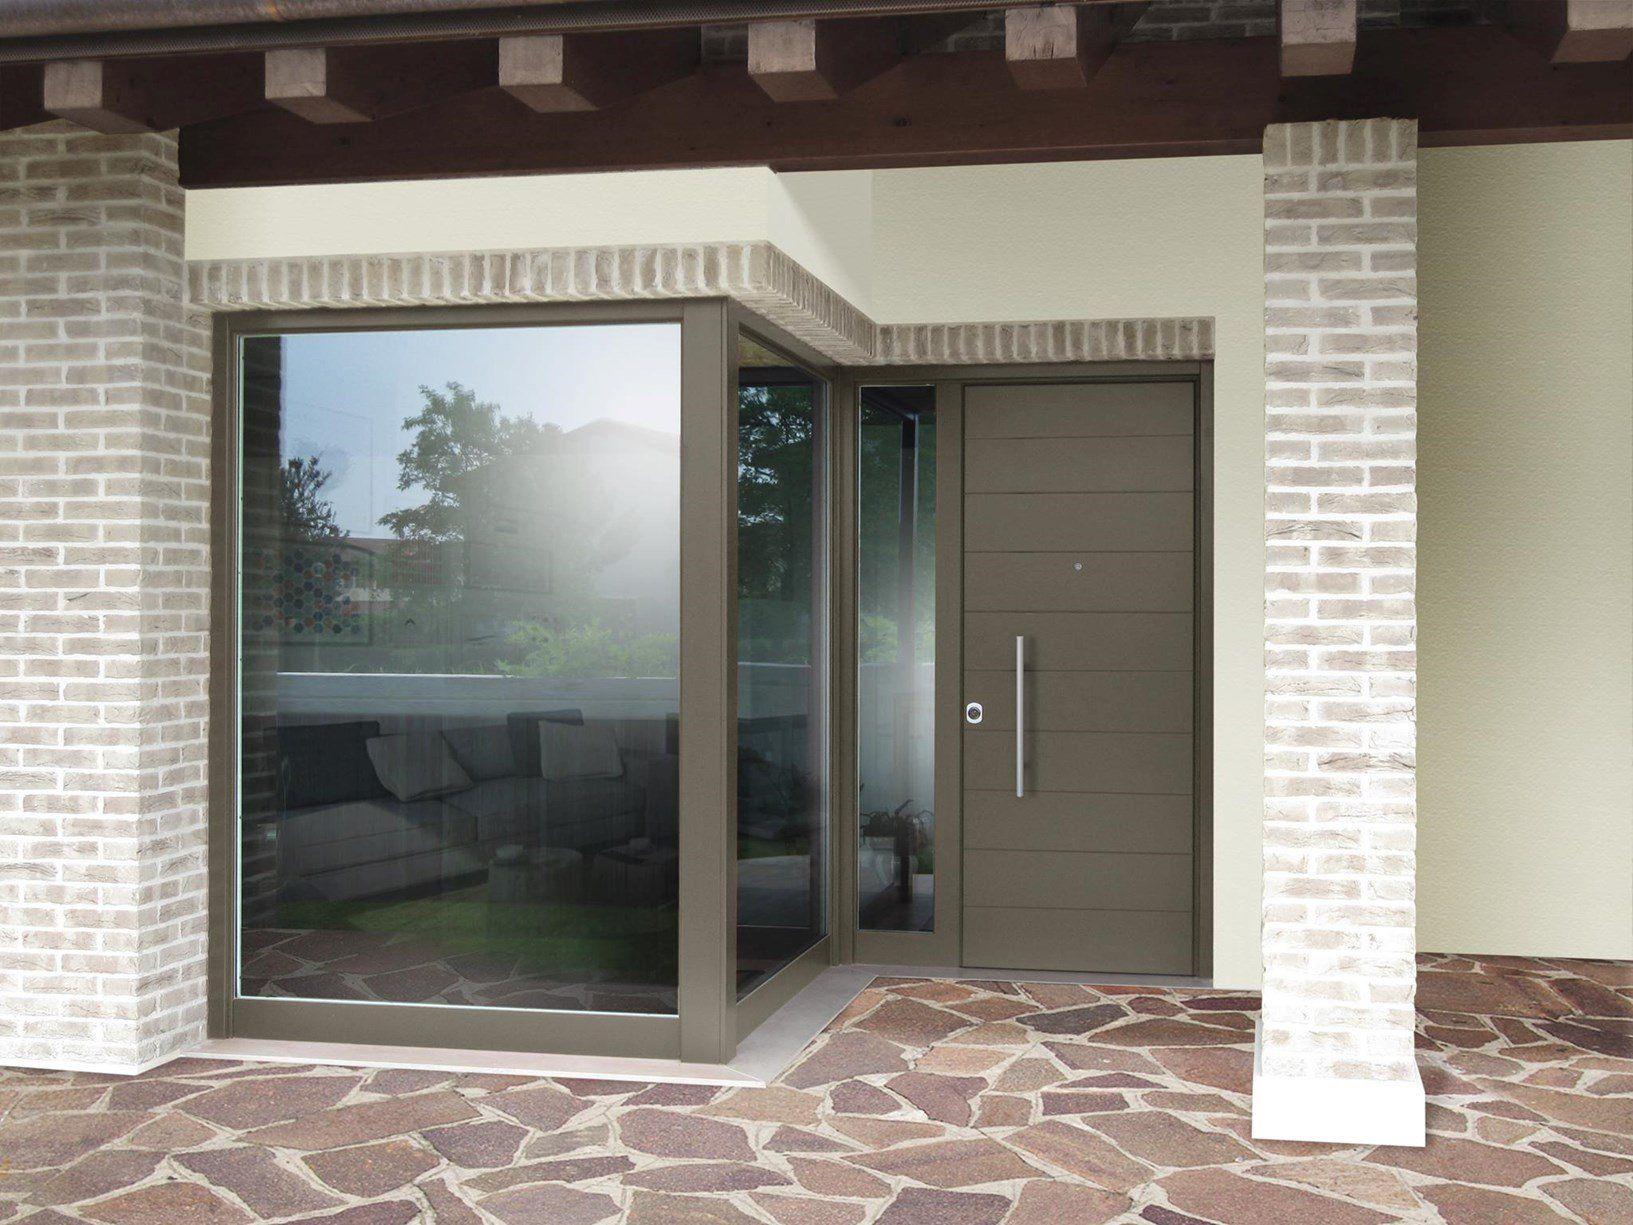 Luminosità in totale sicurezza: le vetrate panoramiche Bauxt